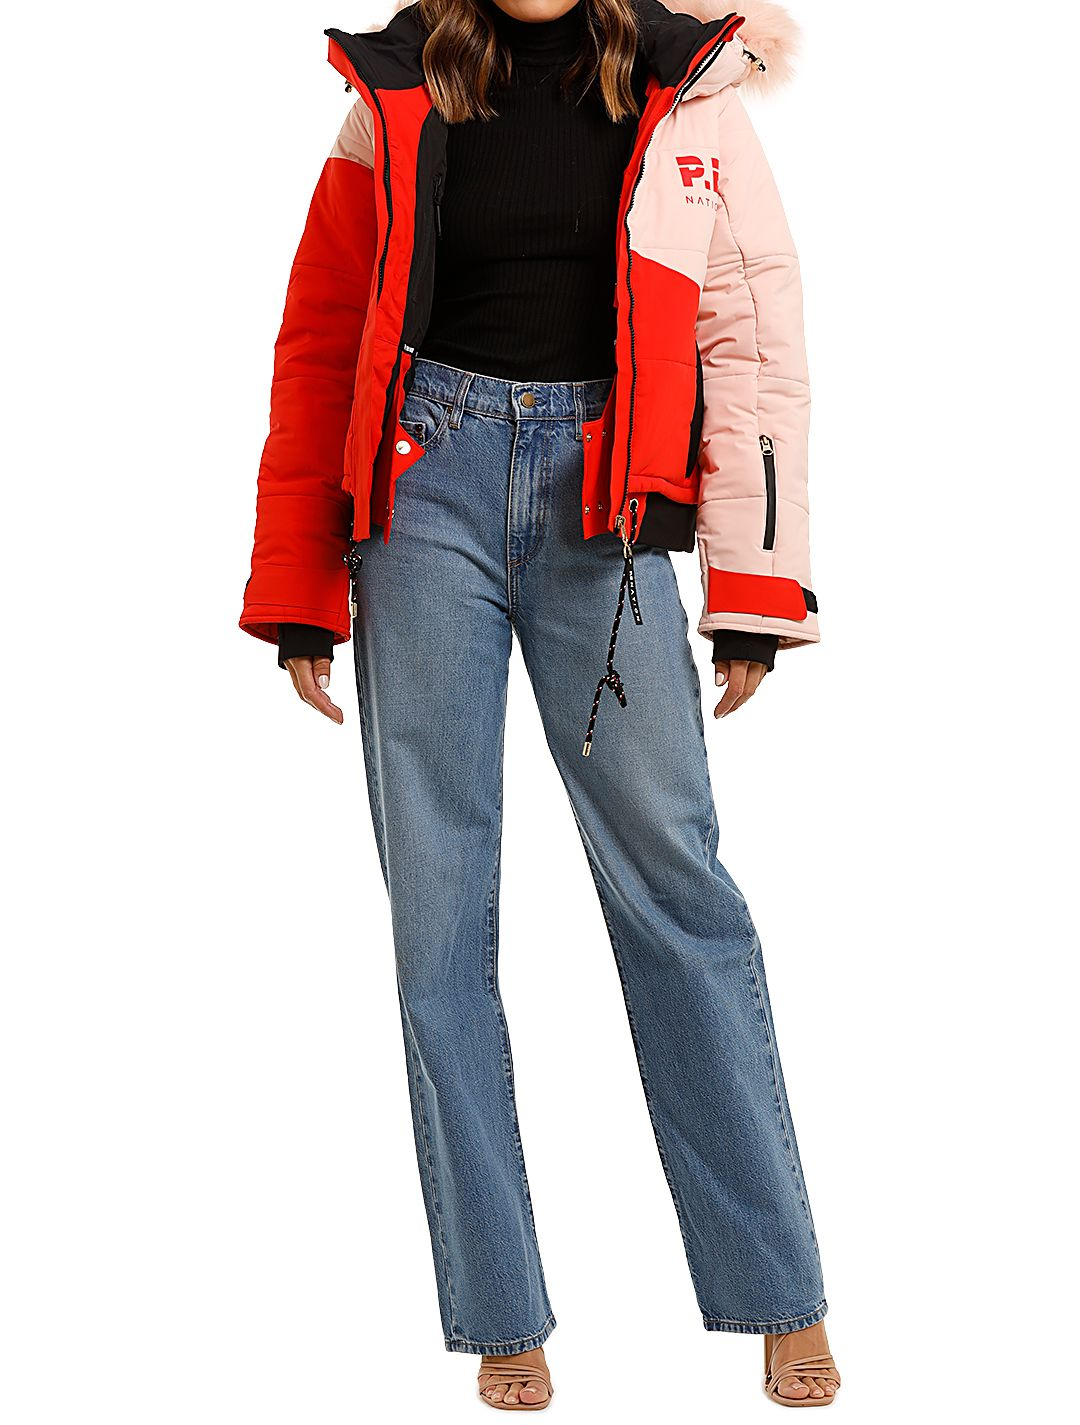 PE Nation Amplitude Ski Jacket Red Pink